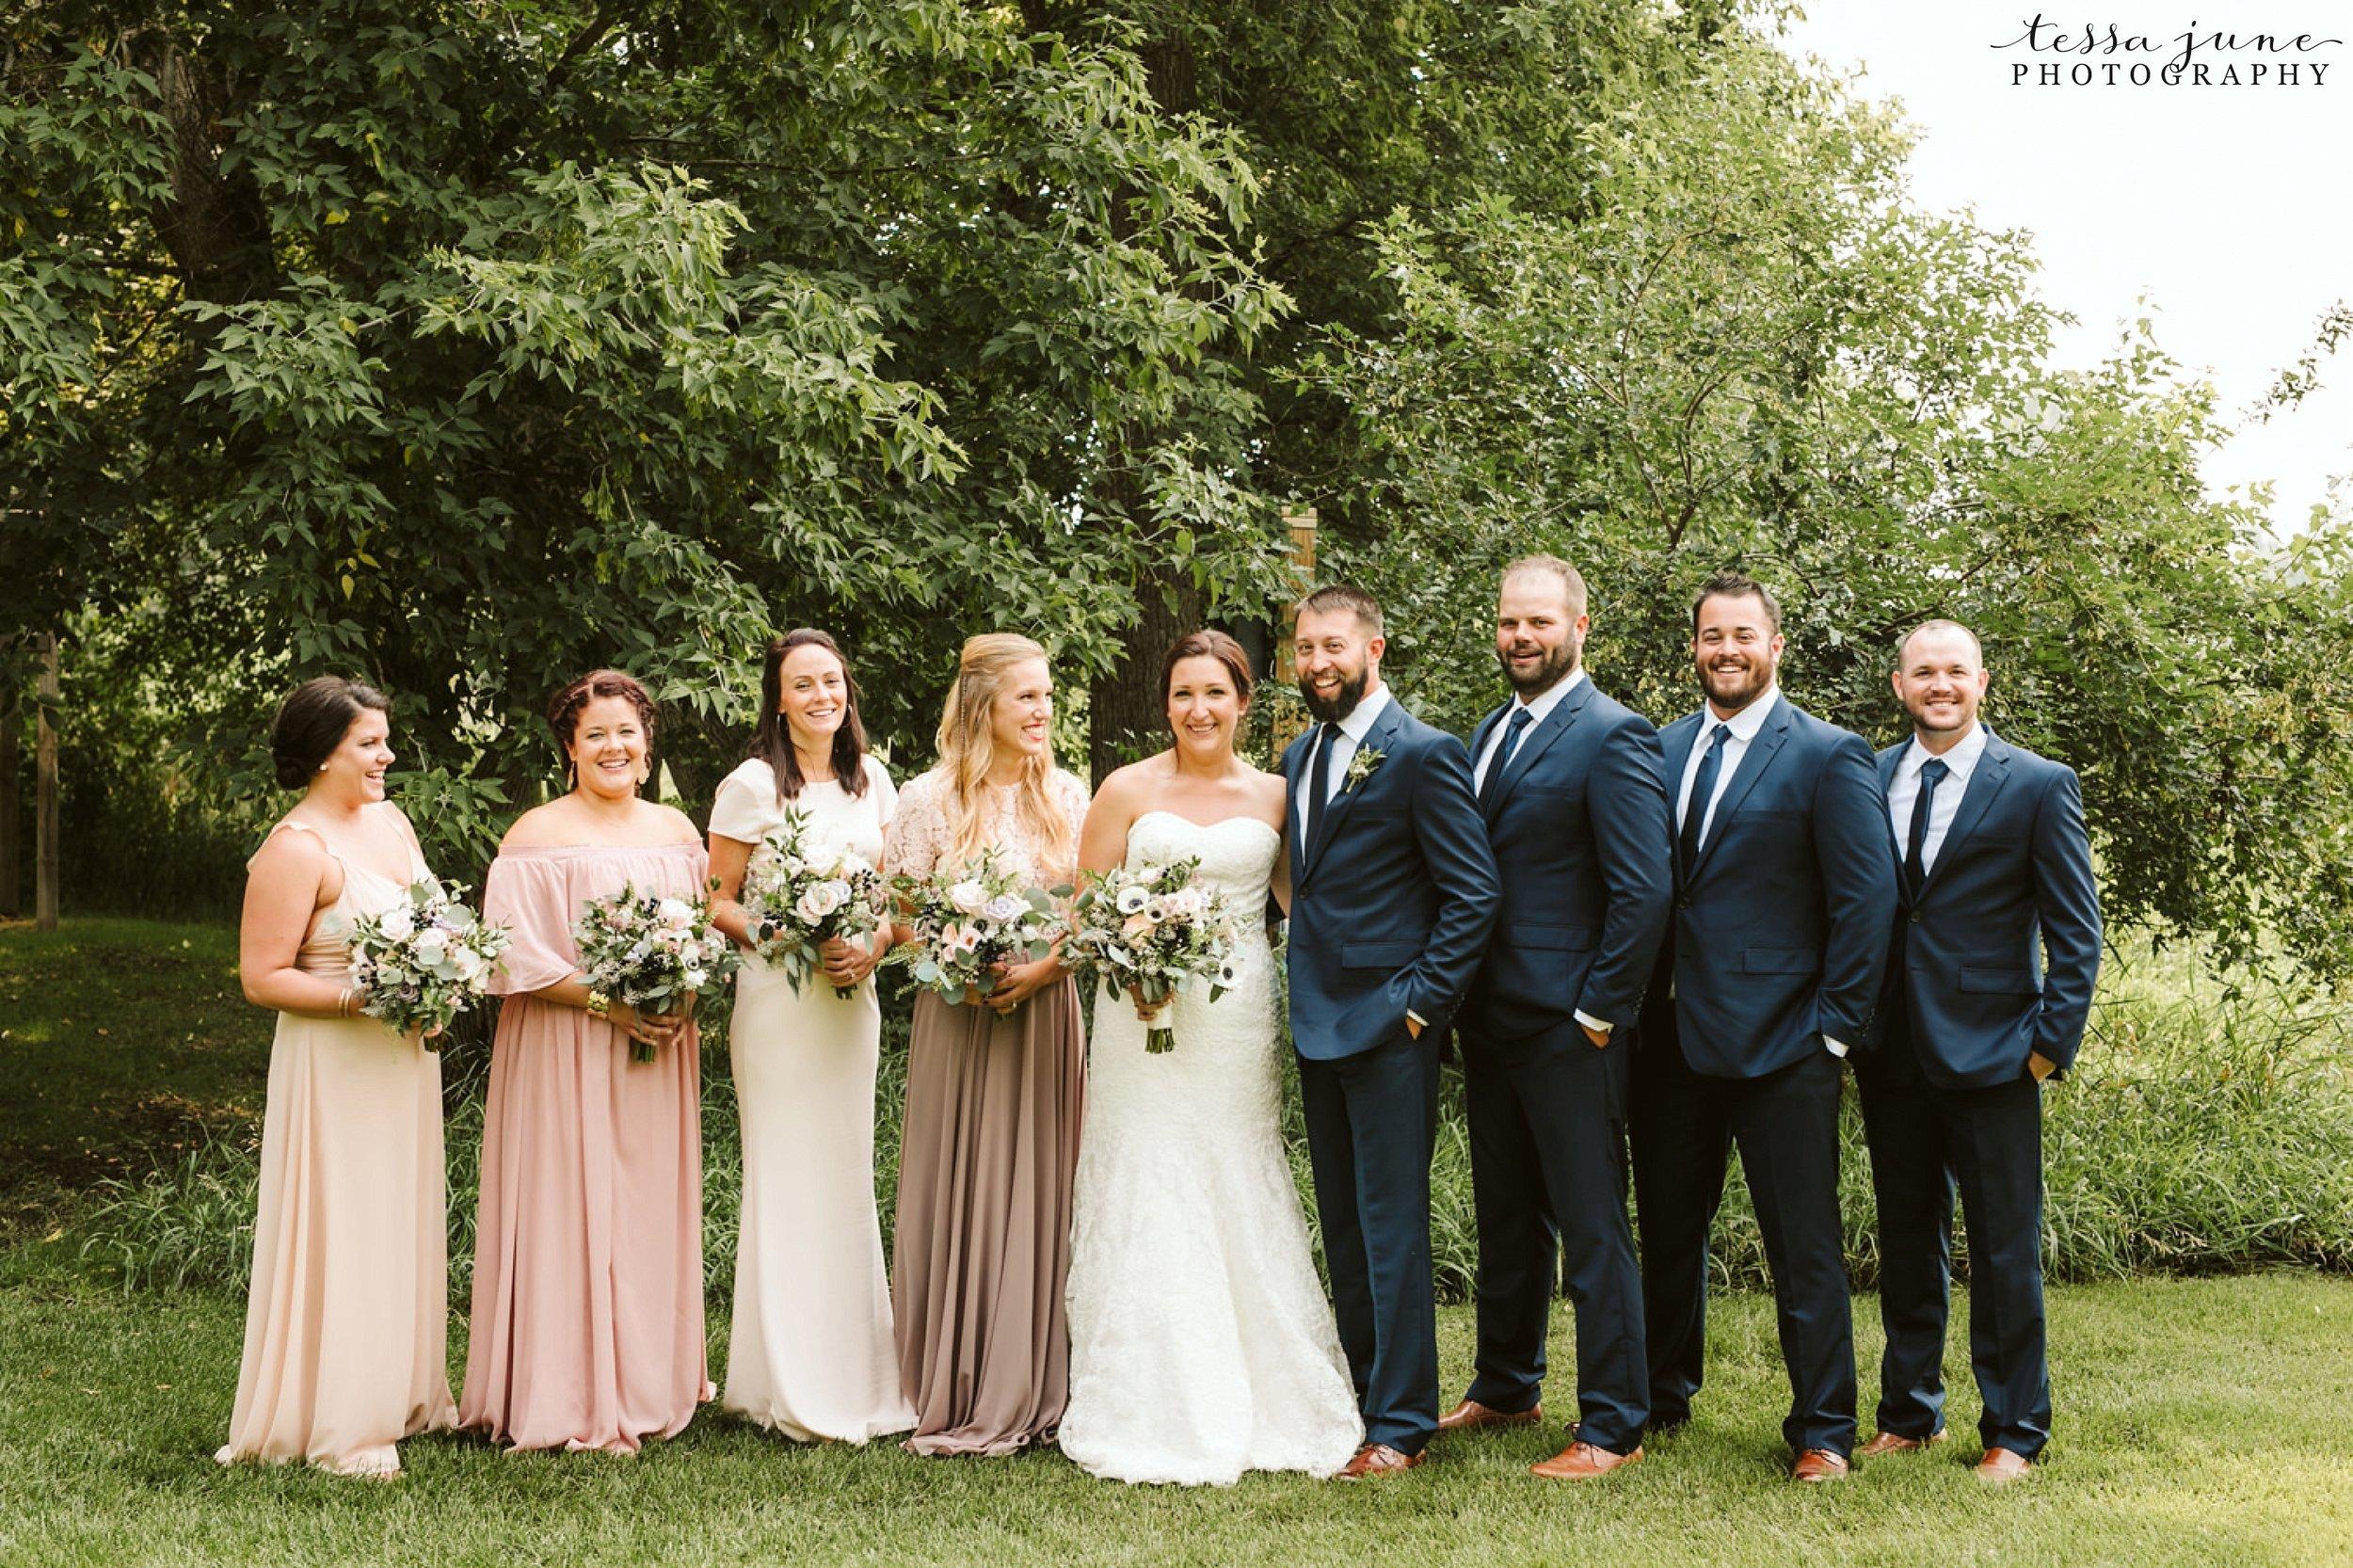 gathered-oaks-barn-wedding-alexandria-minnesota-1.jpg